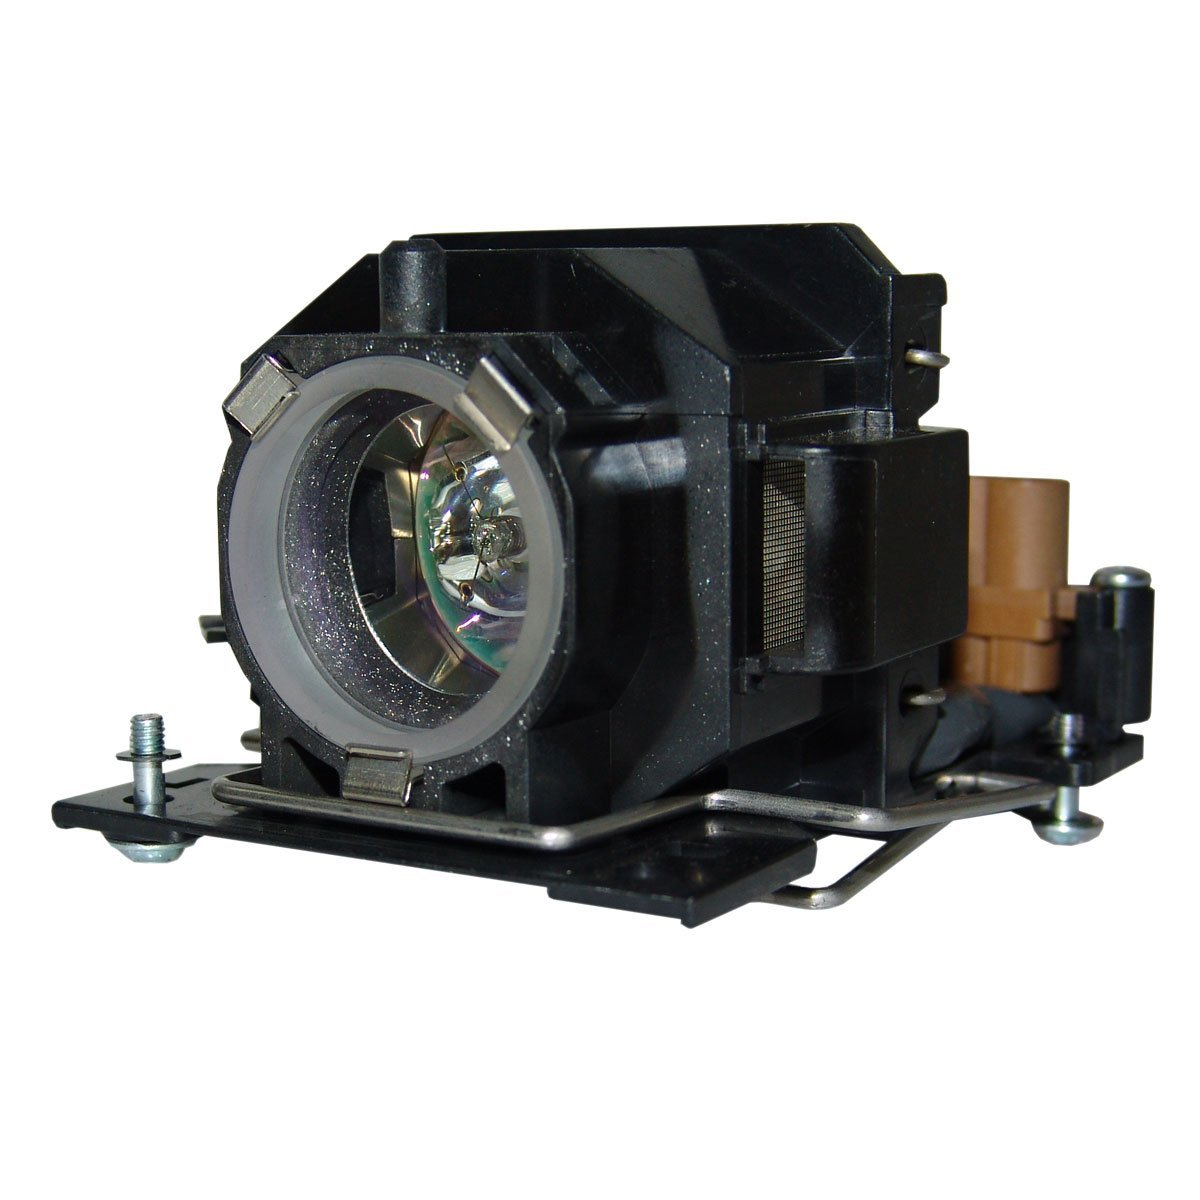 Lutema RLC-039-P01 Viewsonic RLC-039 LCD/DLP Projector Lamp, Philips Inside